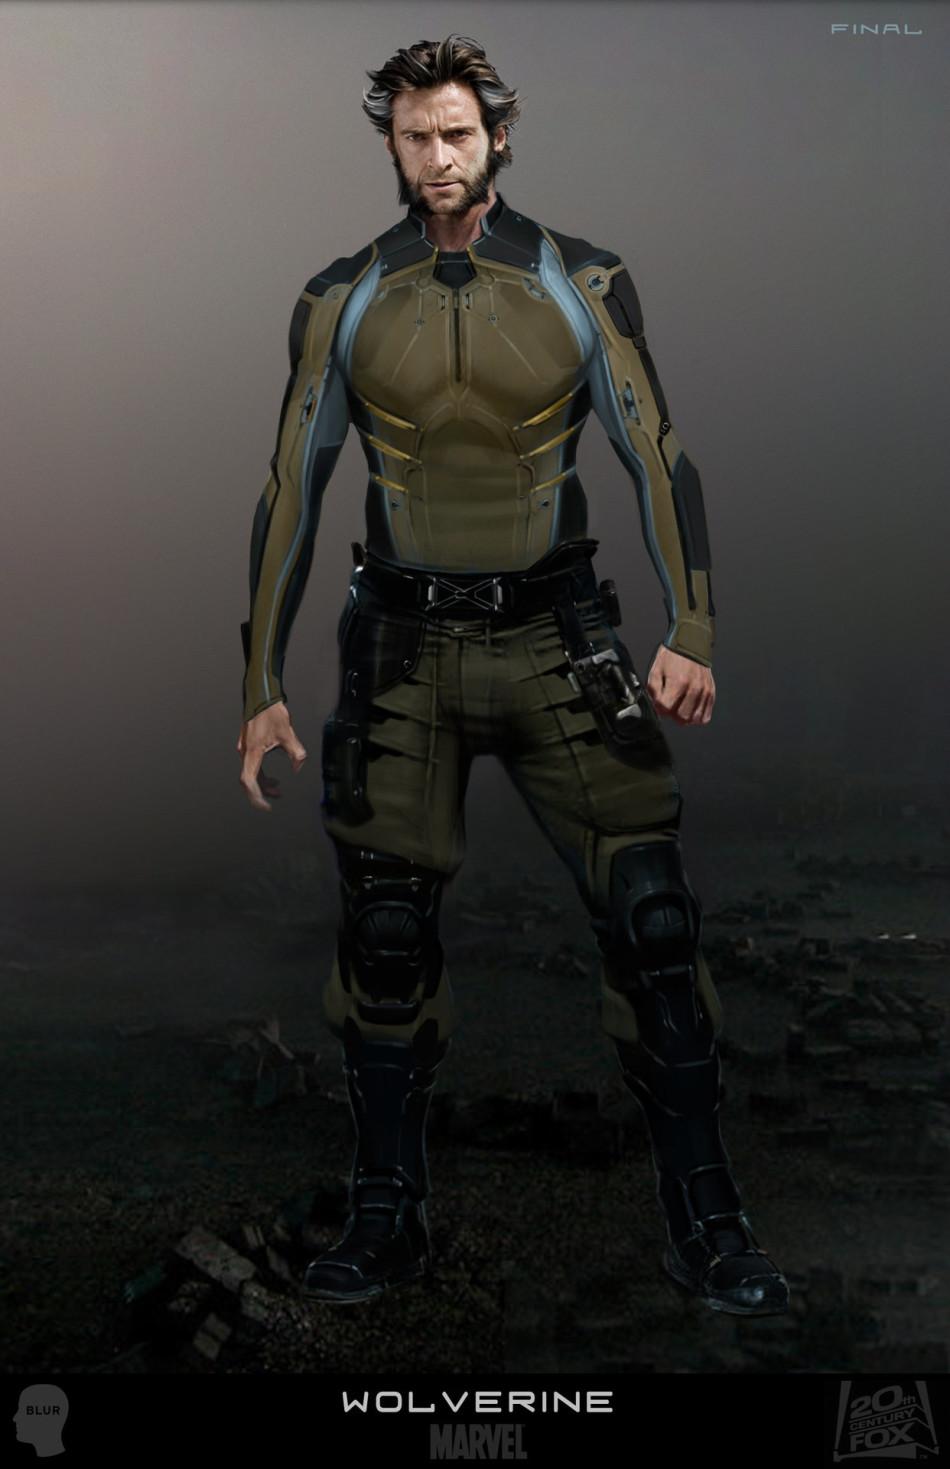 《x战警:逆转未来》造型设计 金刚狼酷炫